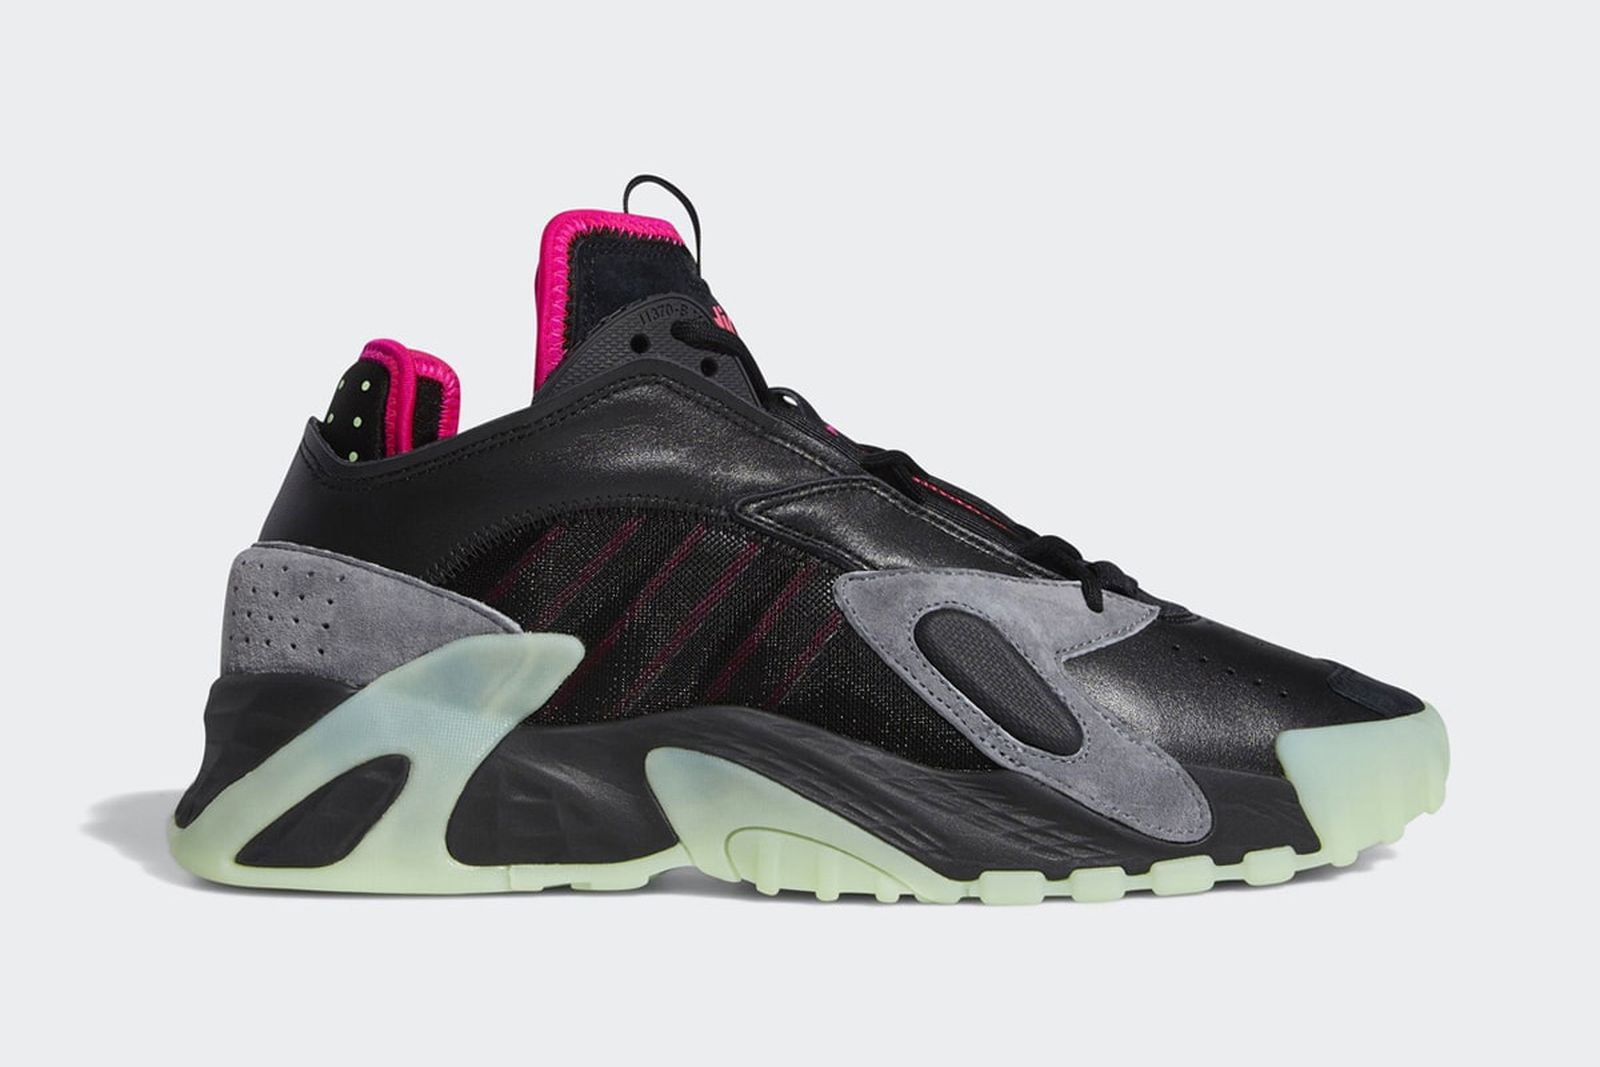 cualquier cosa el estudio Apéndice  This adidas Streetball Features an Iconic Nike Air Yeezy Colorway